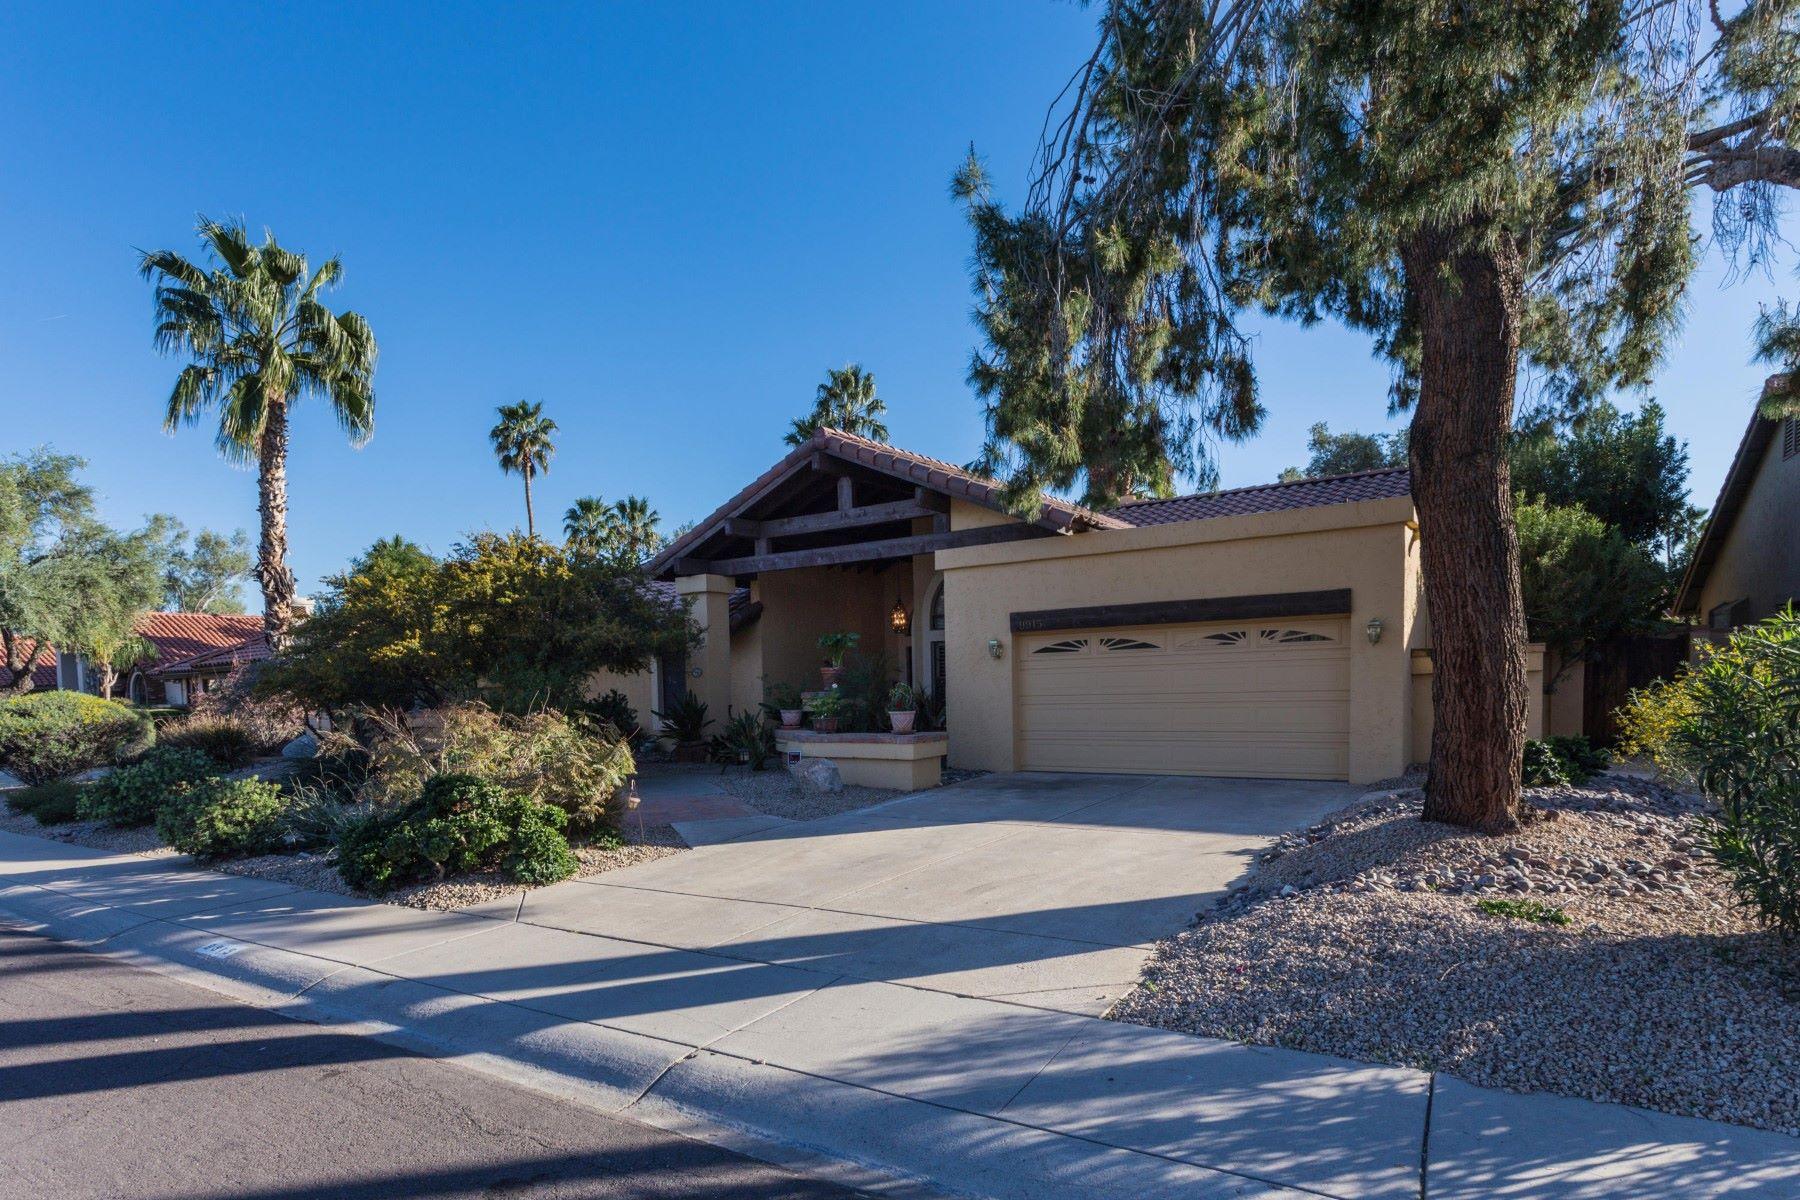 Villa per Vendita alle ore Charming Scottsdale Ranch home 9915 E Cinnabar Ave Scottsdale, Arizona, 85258 Stati Uniti